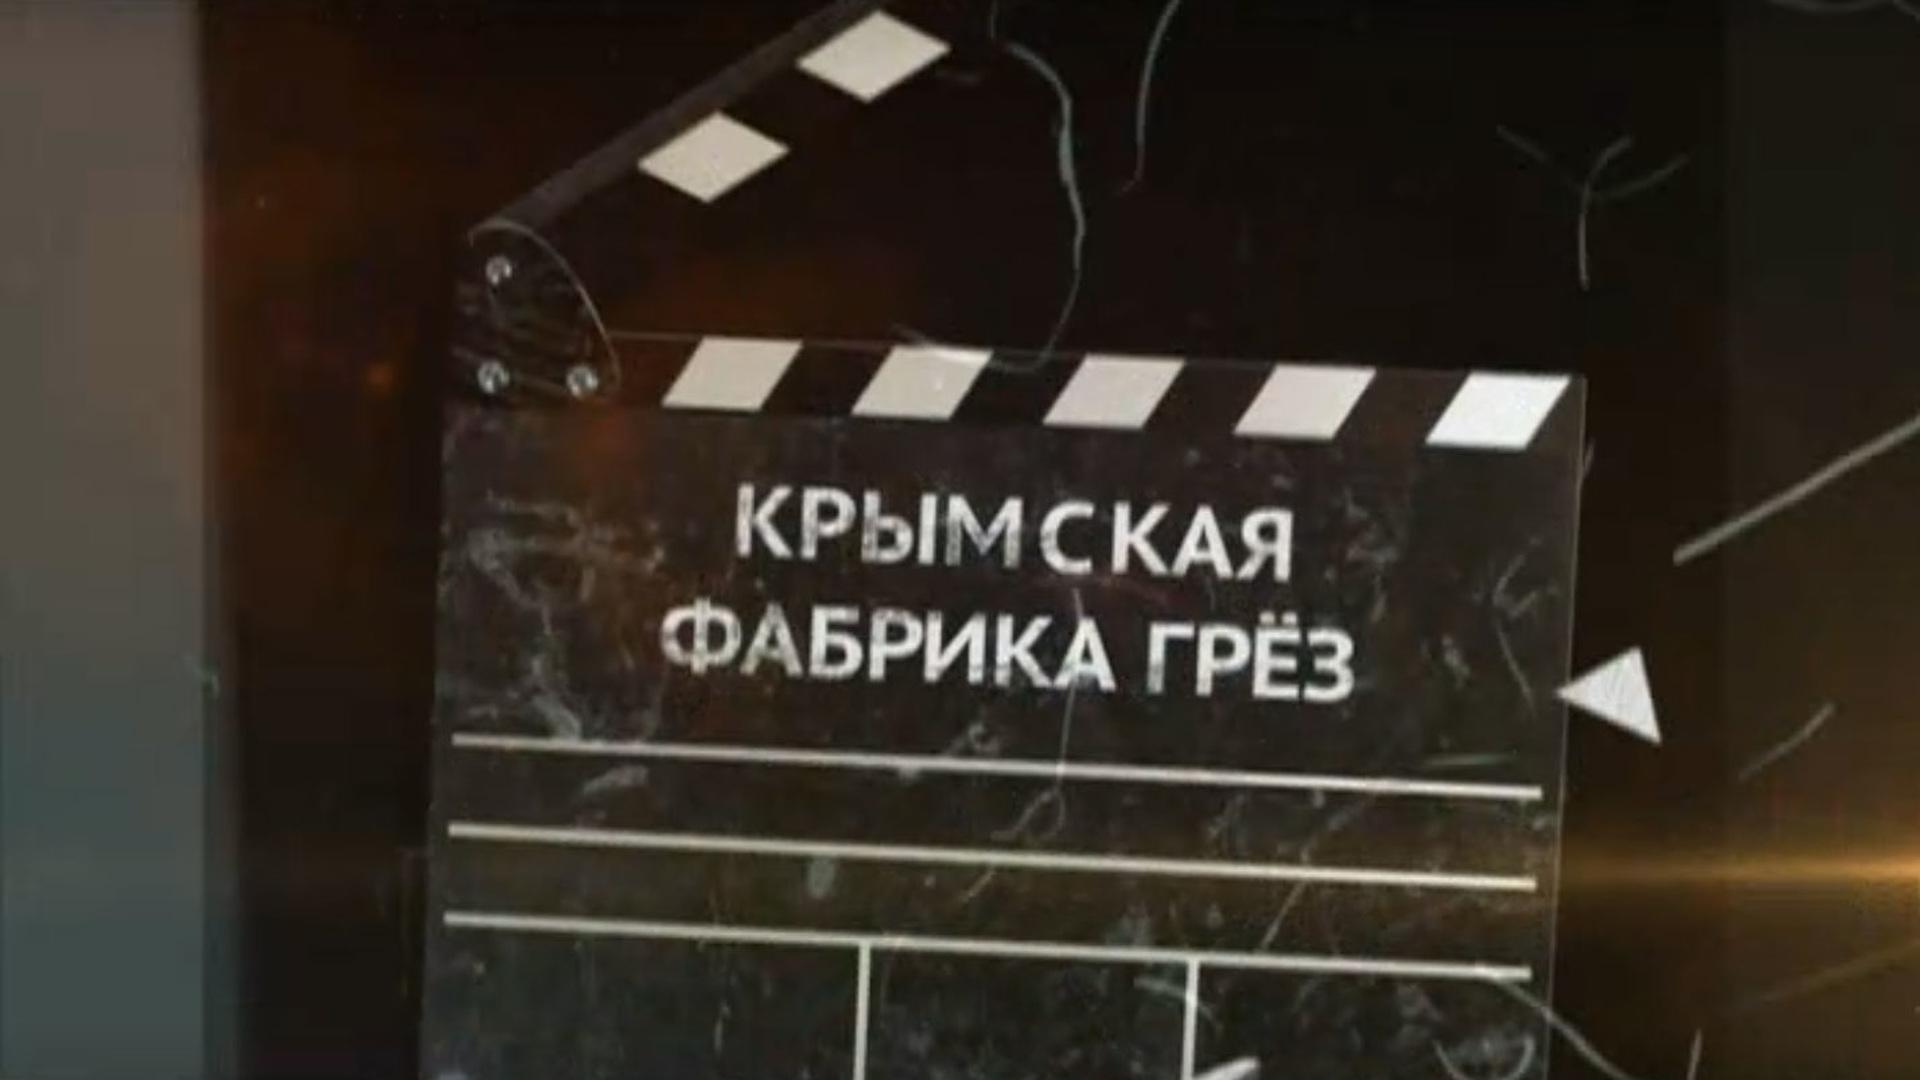 Крымская фабрика грез